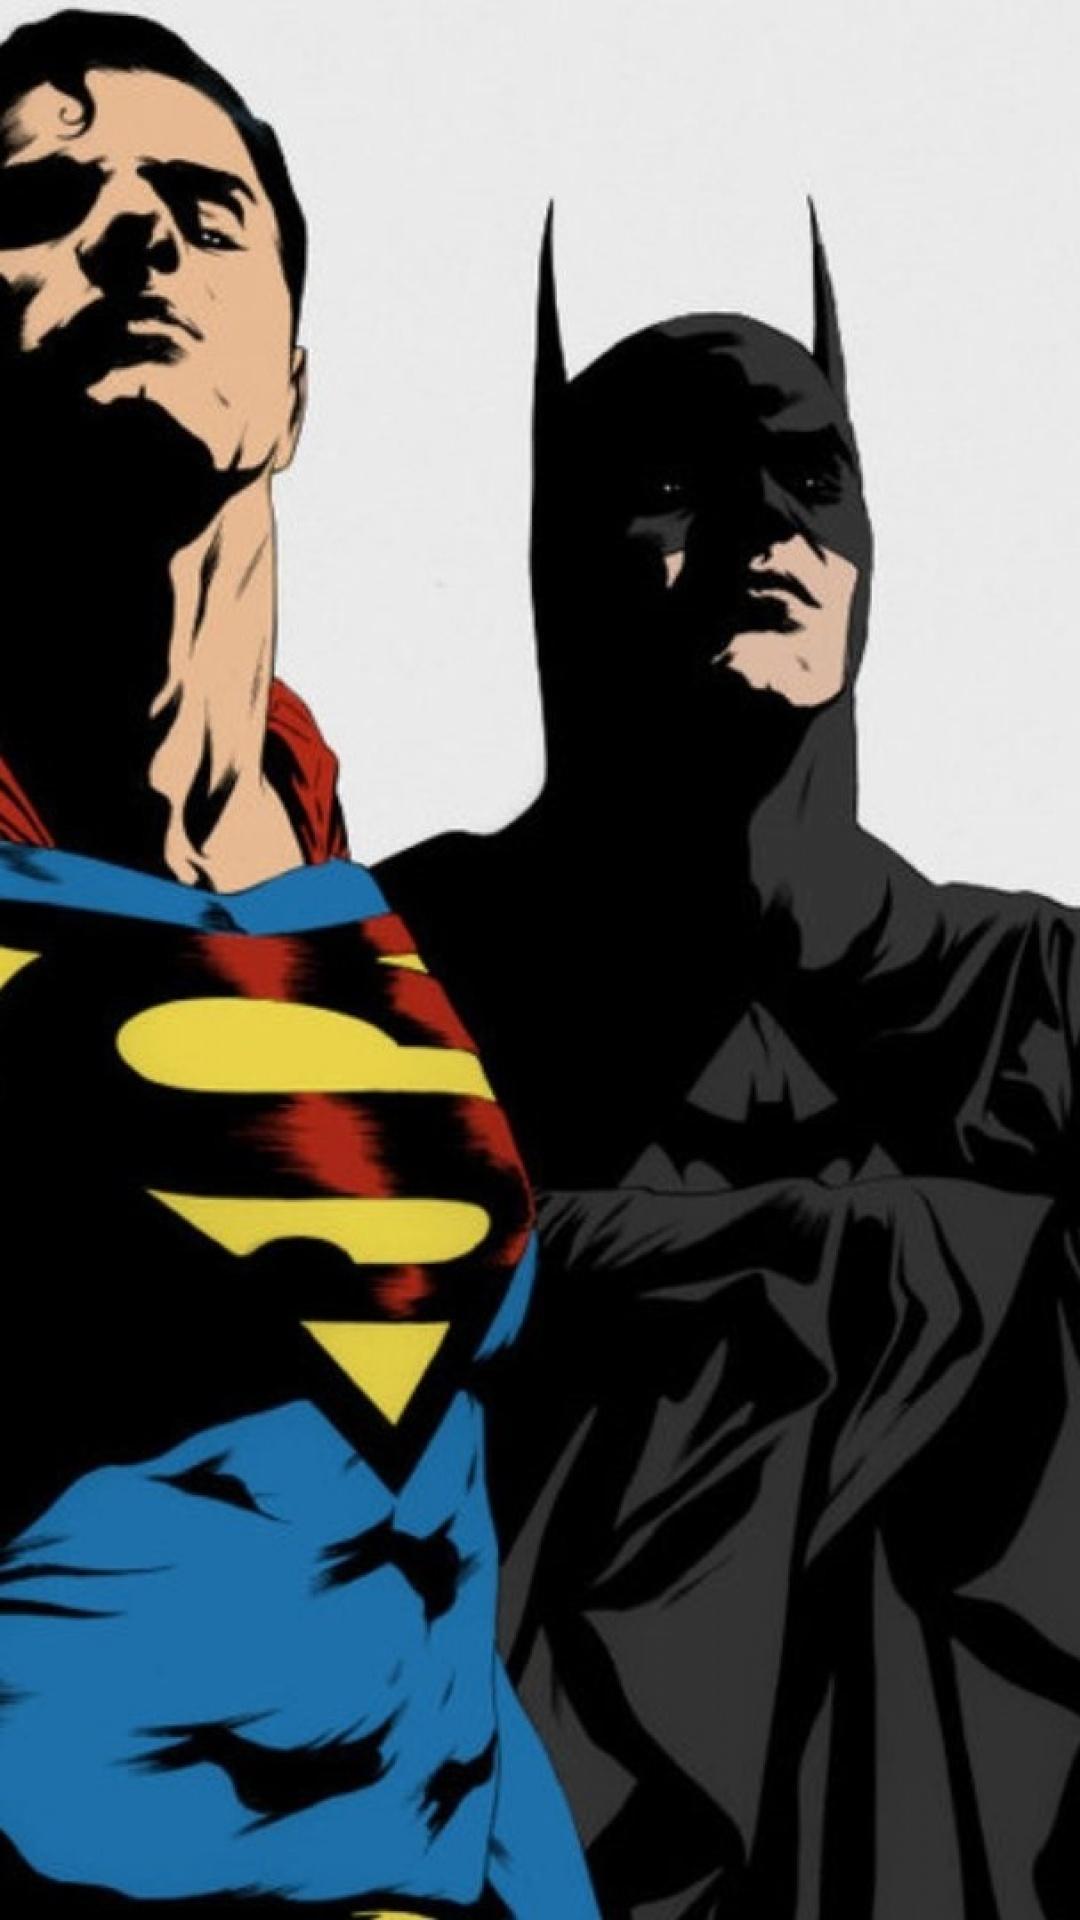 superheroes wallpaper dc superheroes hd mobile wallpaper